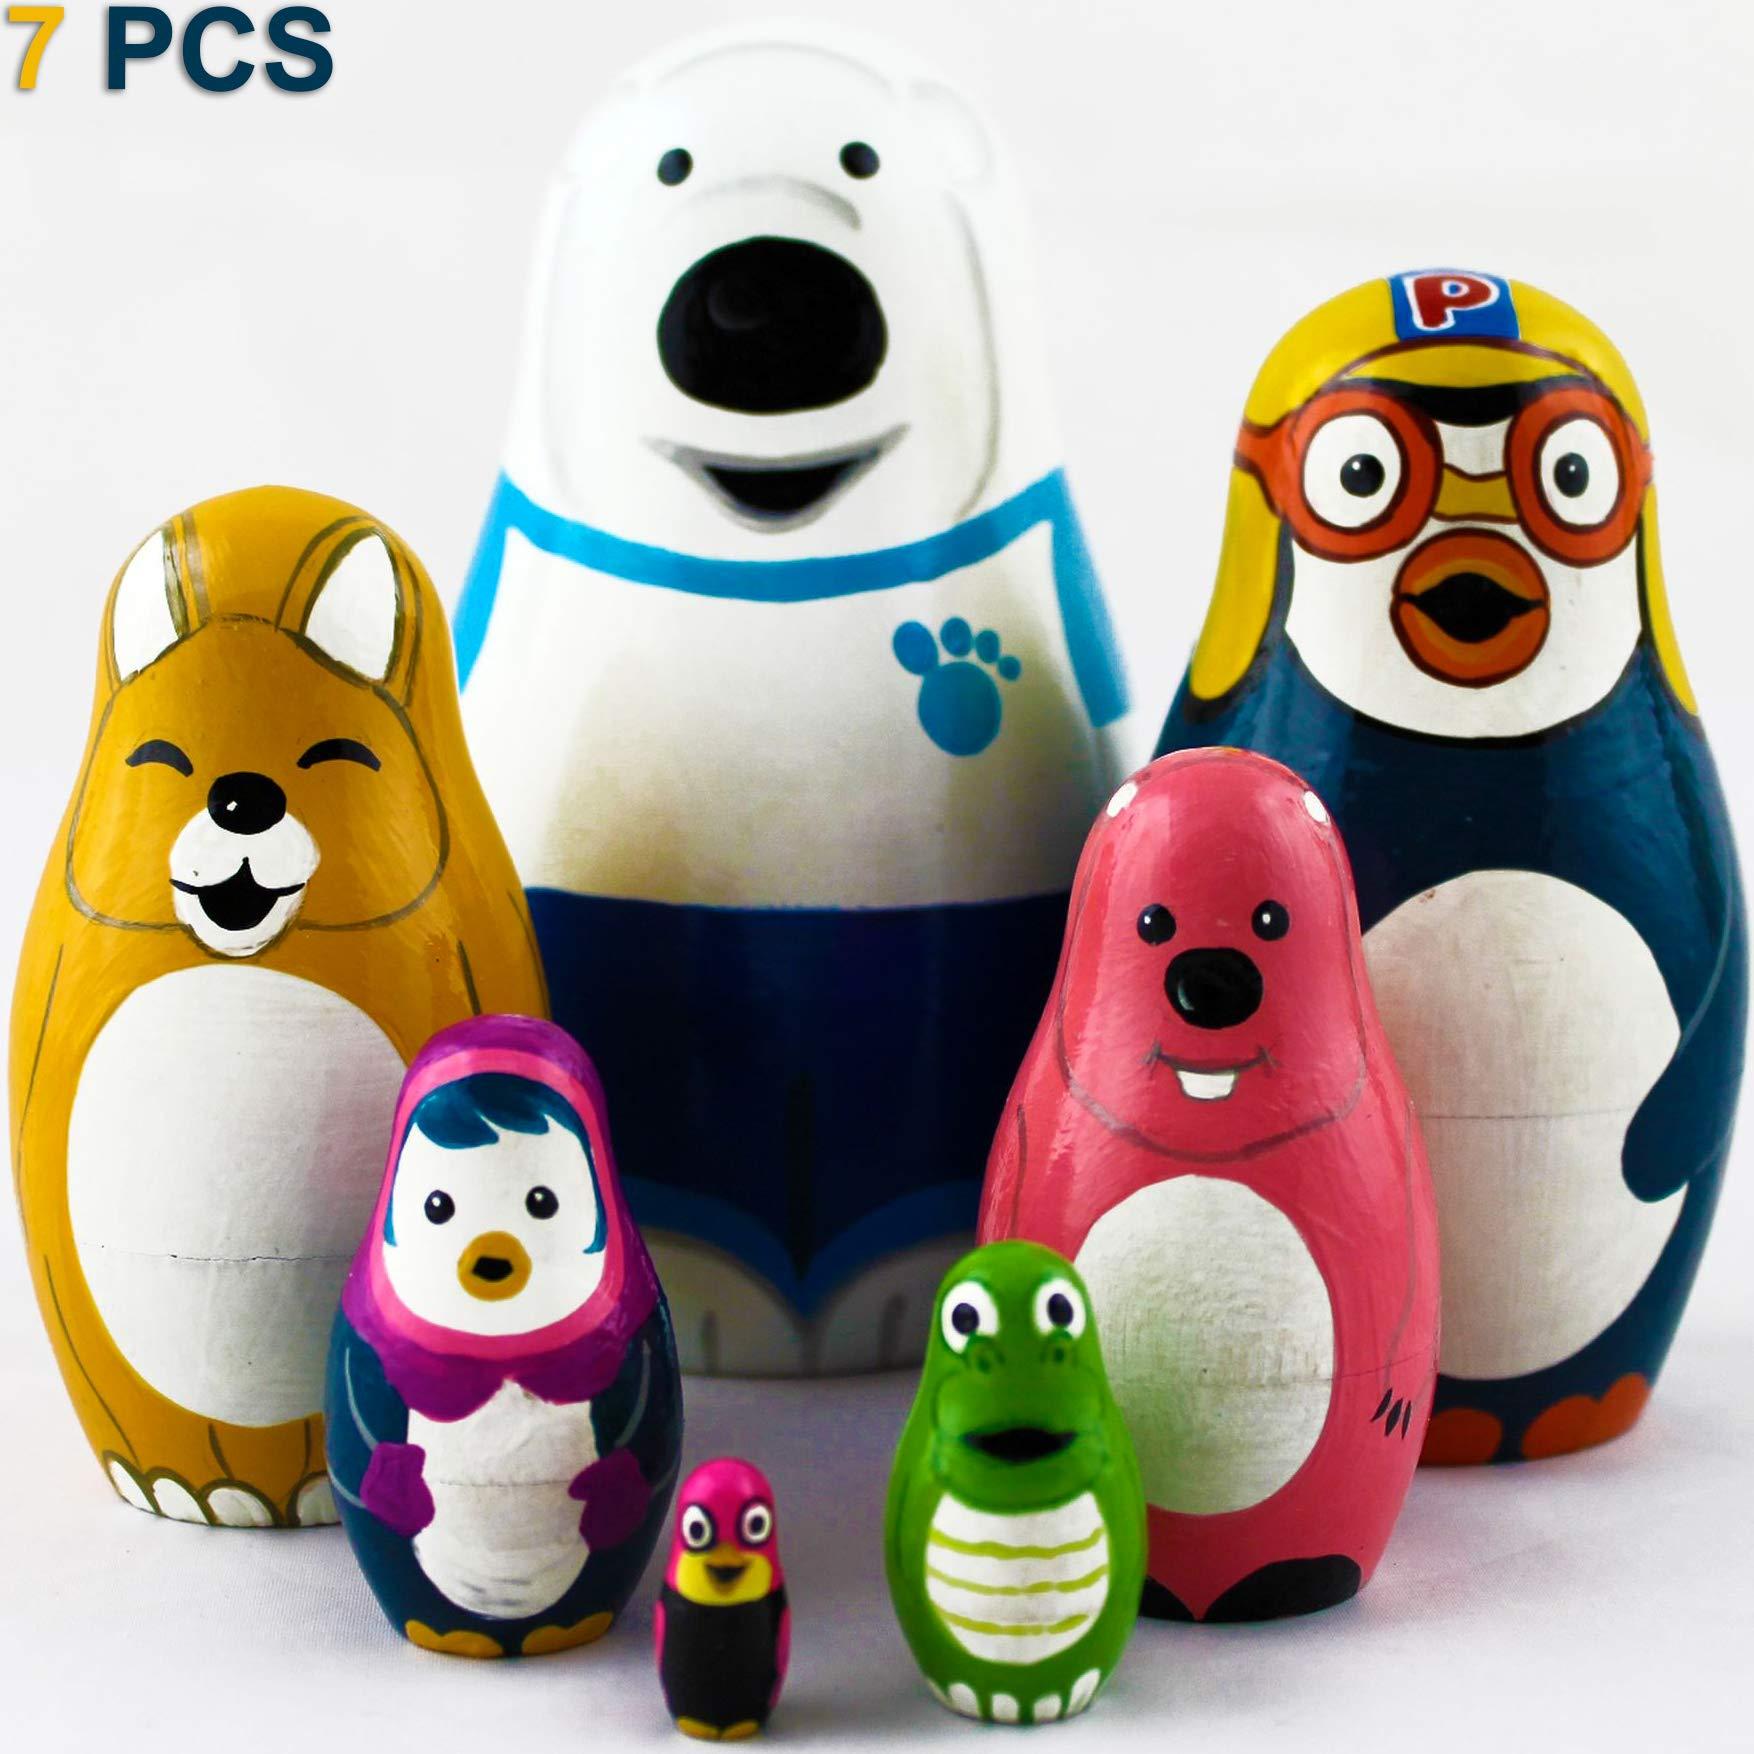 MATRYOSHKA&HANDICRAFT Russian Nesting Dolls Cartoon Characters Pororo The Penguin 7 pcs Wooden Toys by MATRYOSHKA&HANDICRAFT